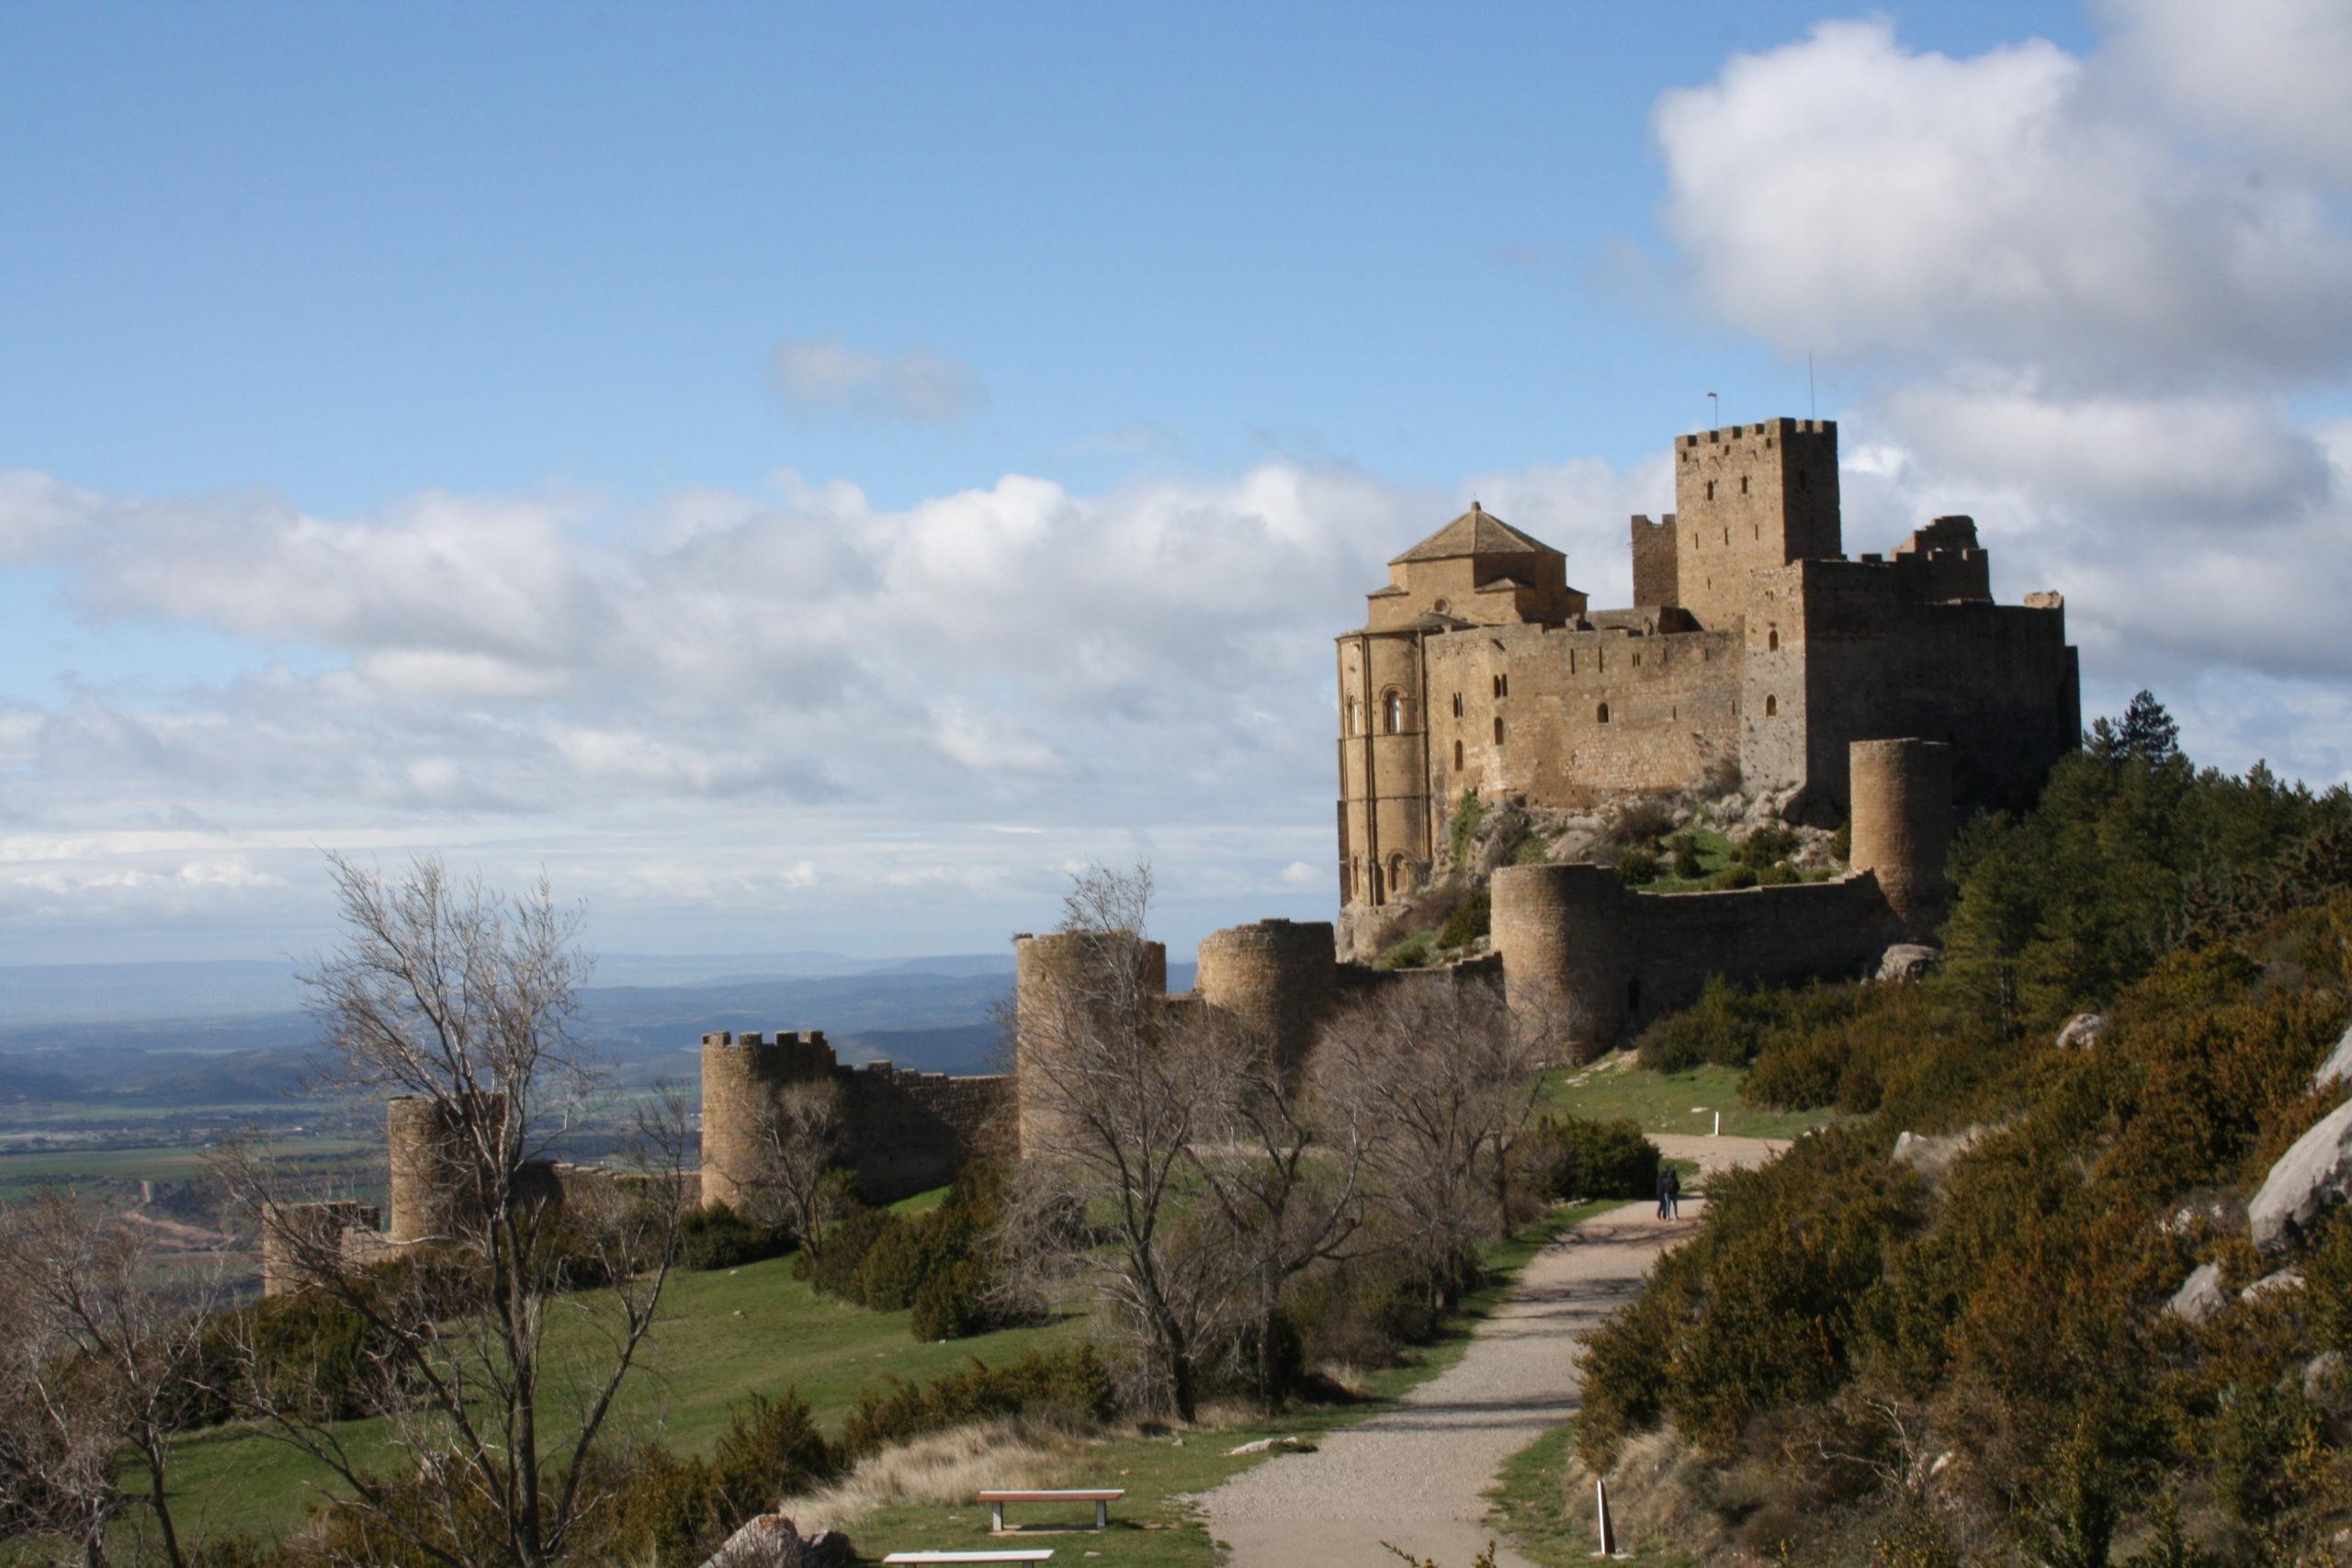 Castle of Loarre. Once of the best Castles in Spain